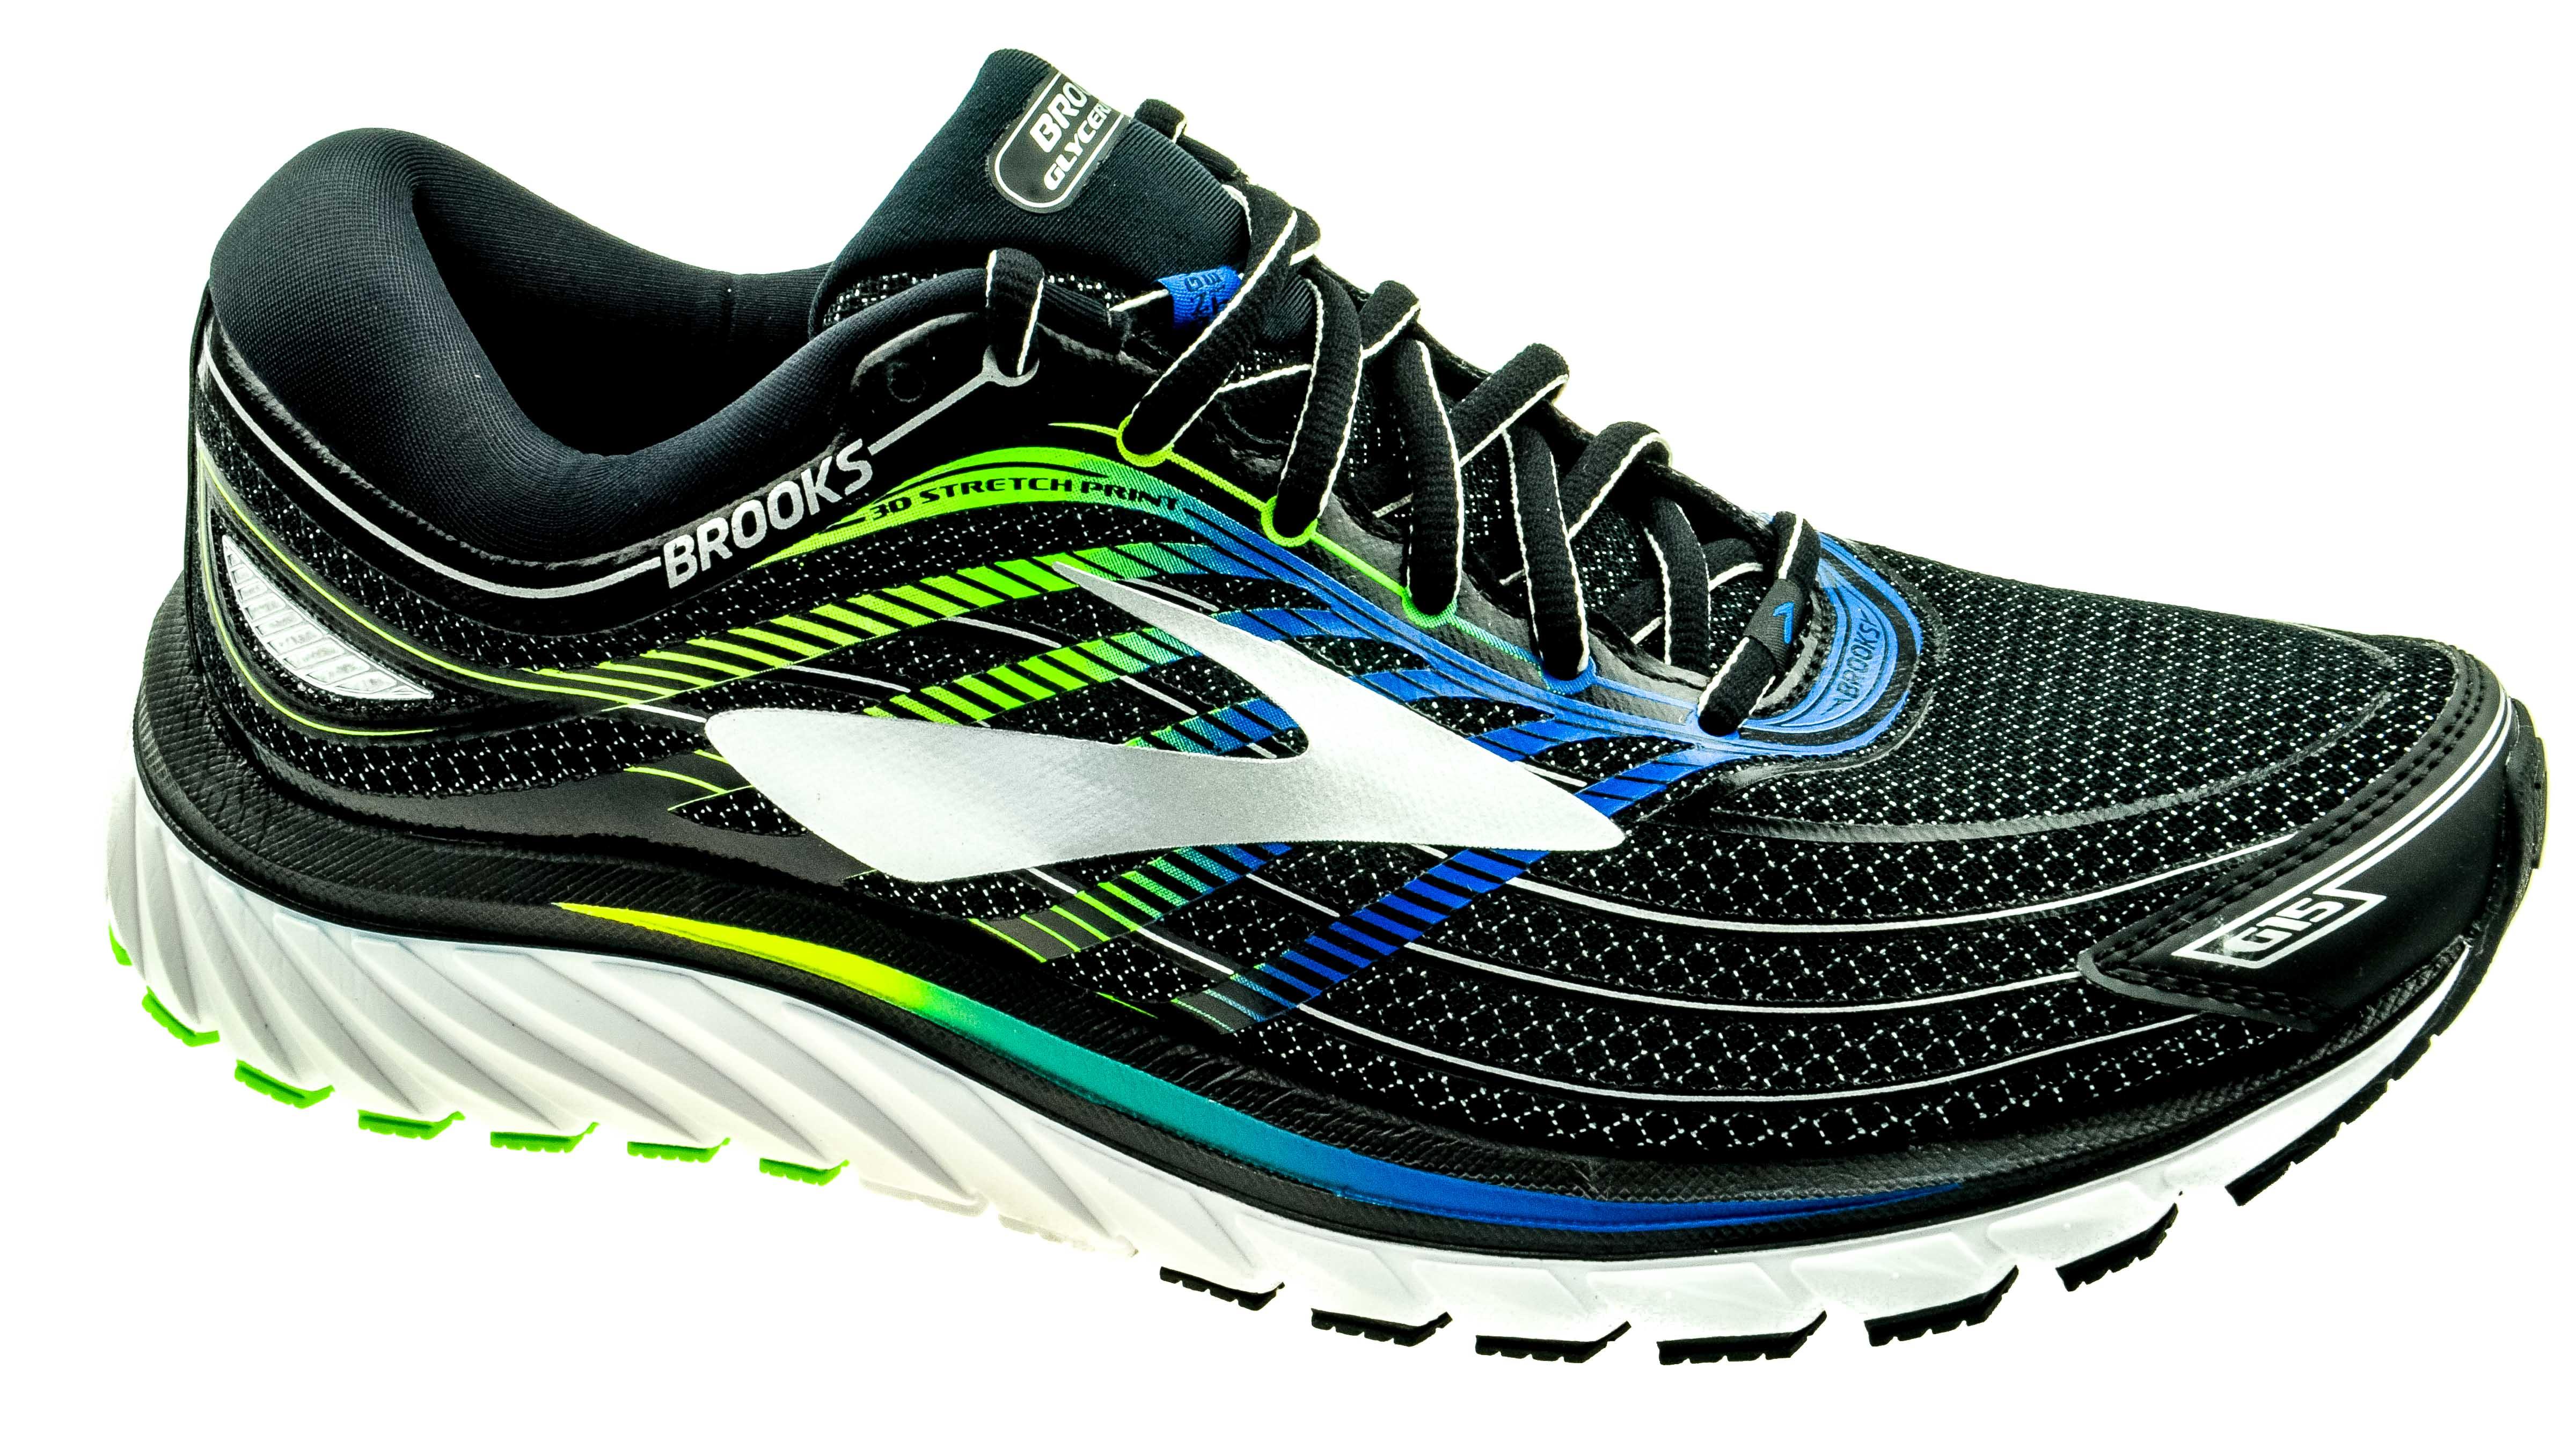 brooks hindu single men Compare 85 brooks mens glycerin products in shoes at shopcom, including brooks glycerin 14 road running shoe - men's - d width, brooks glycerin 13 - mens - black.